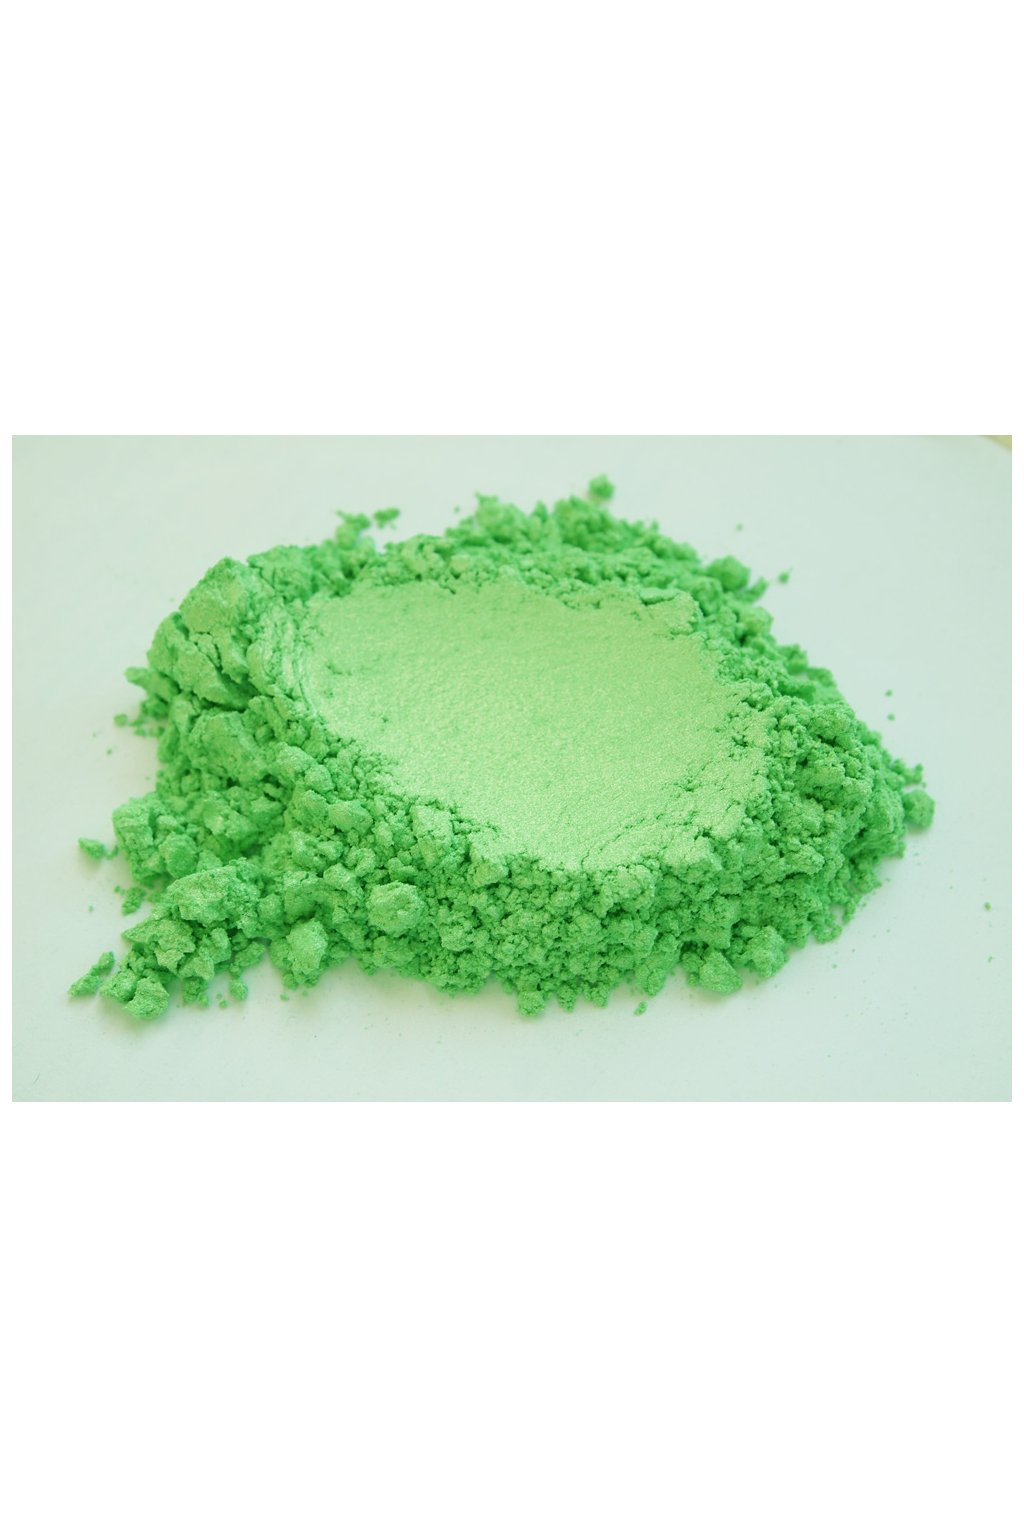 Viper green candy